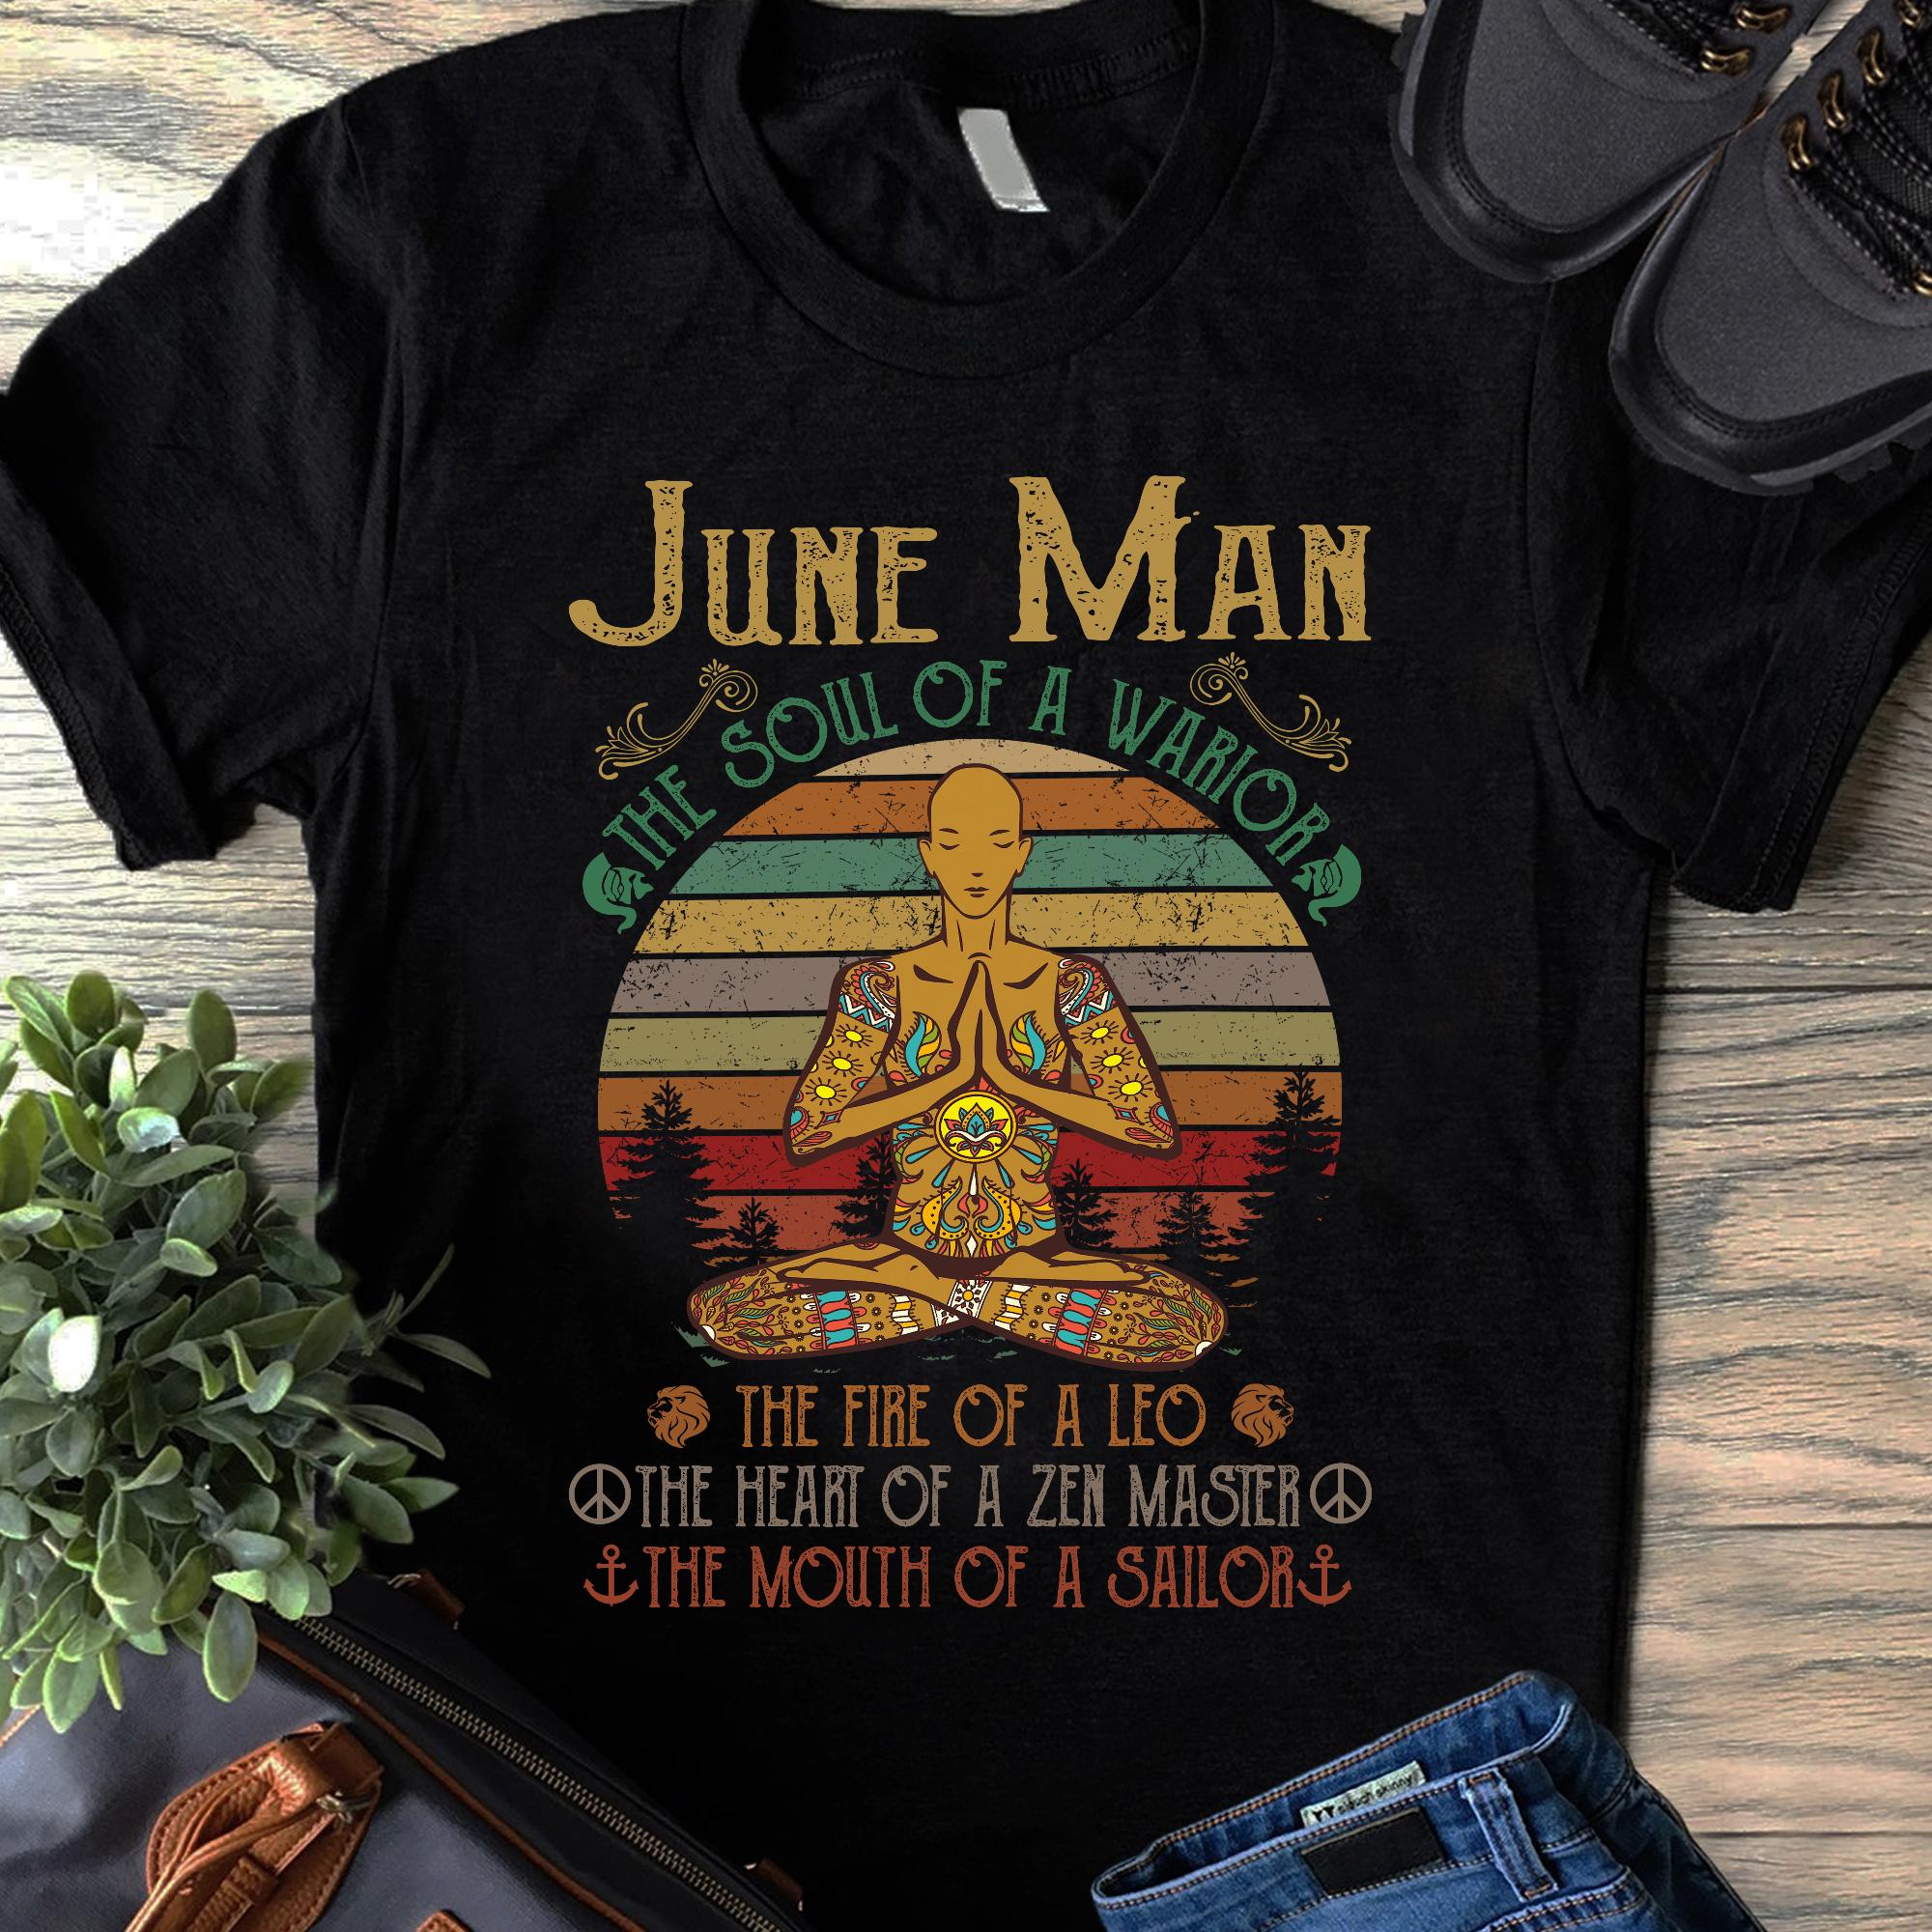 Hippie Yoga Shirt June Man The Soul Of A Warrior